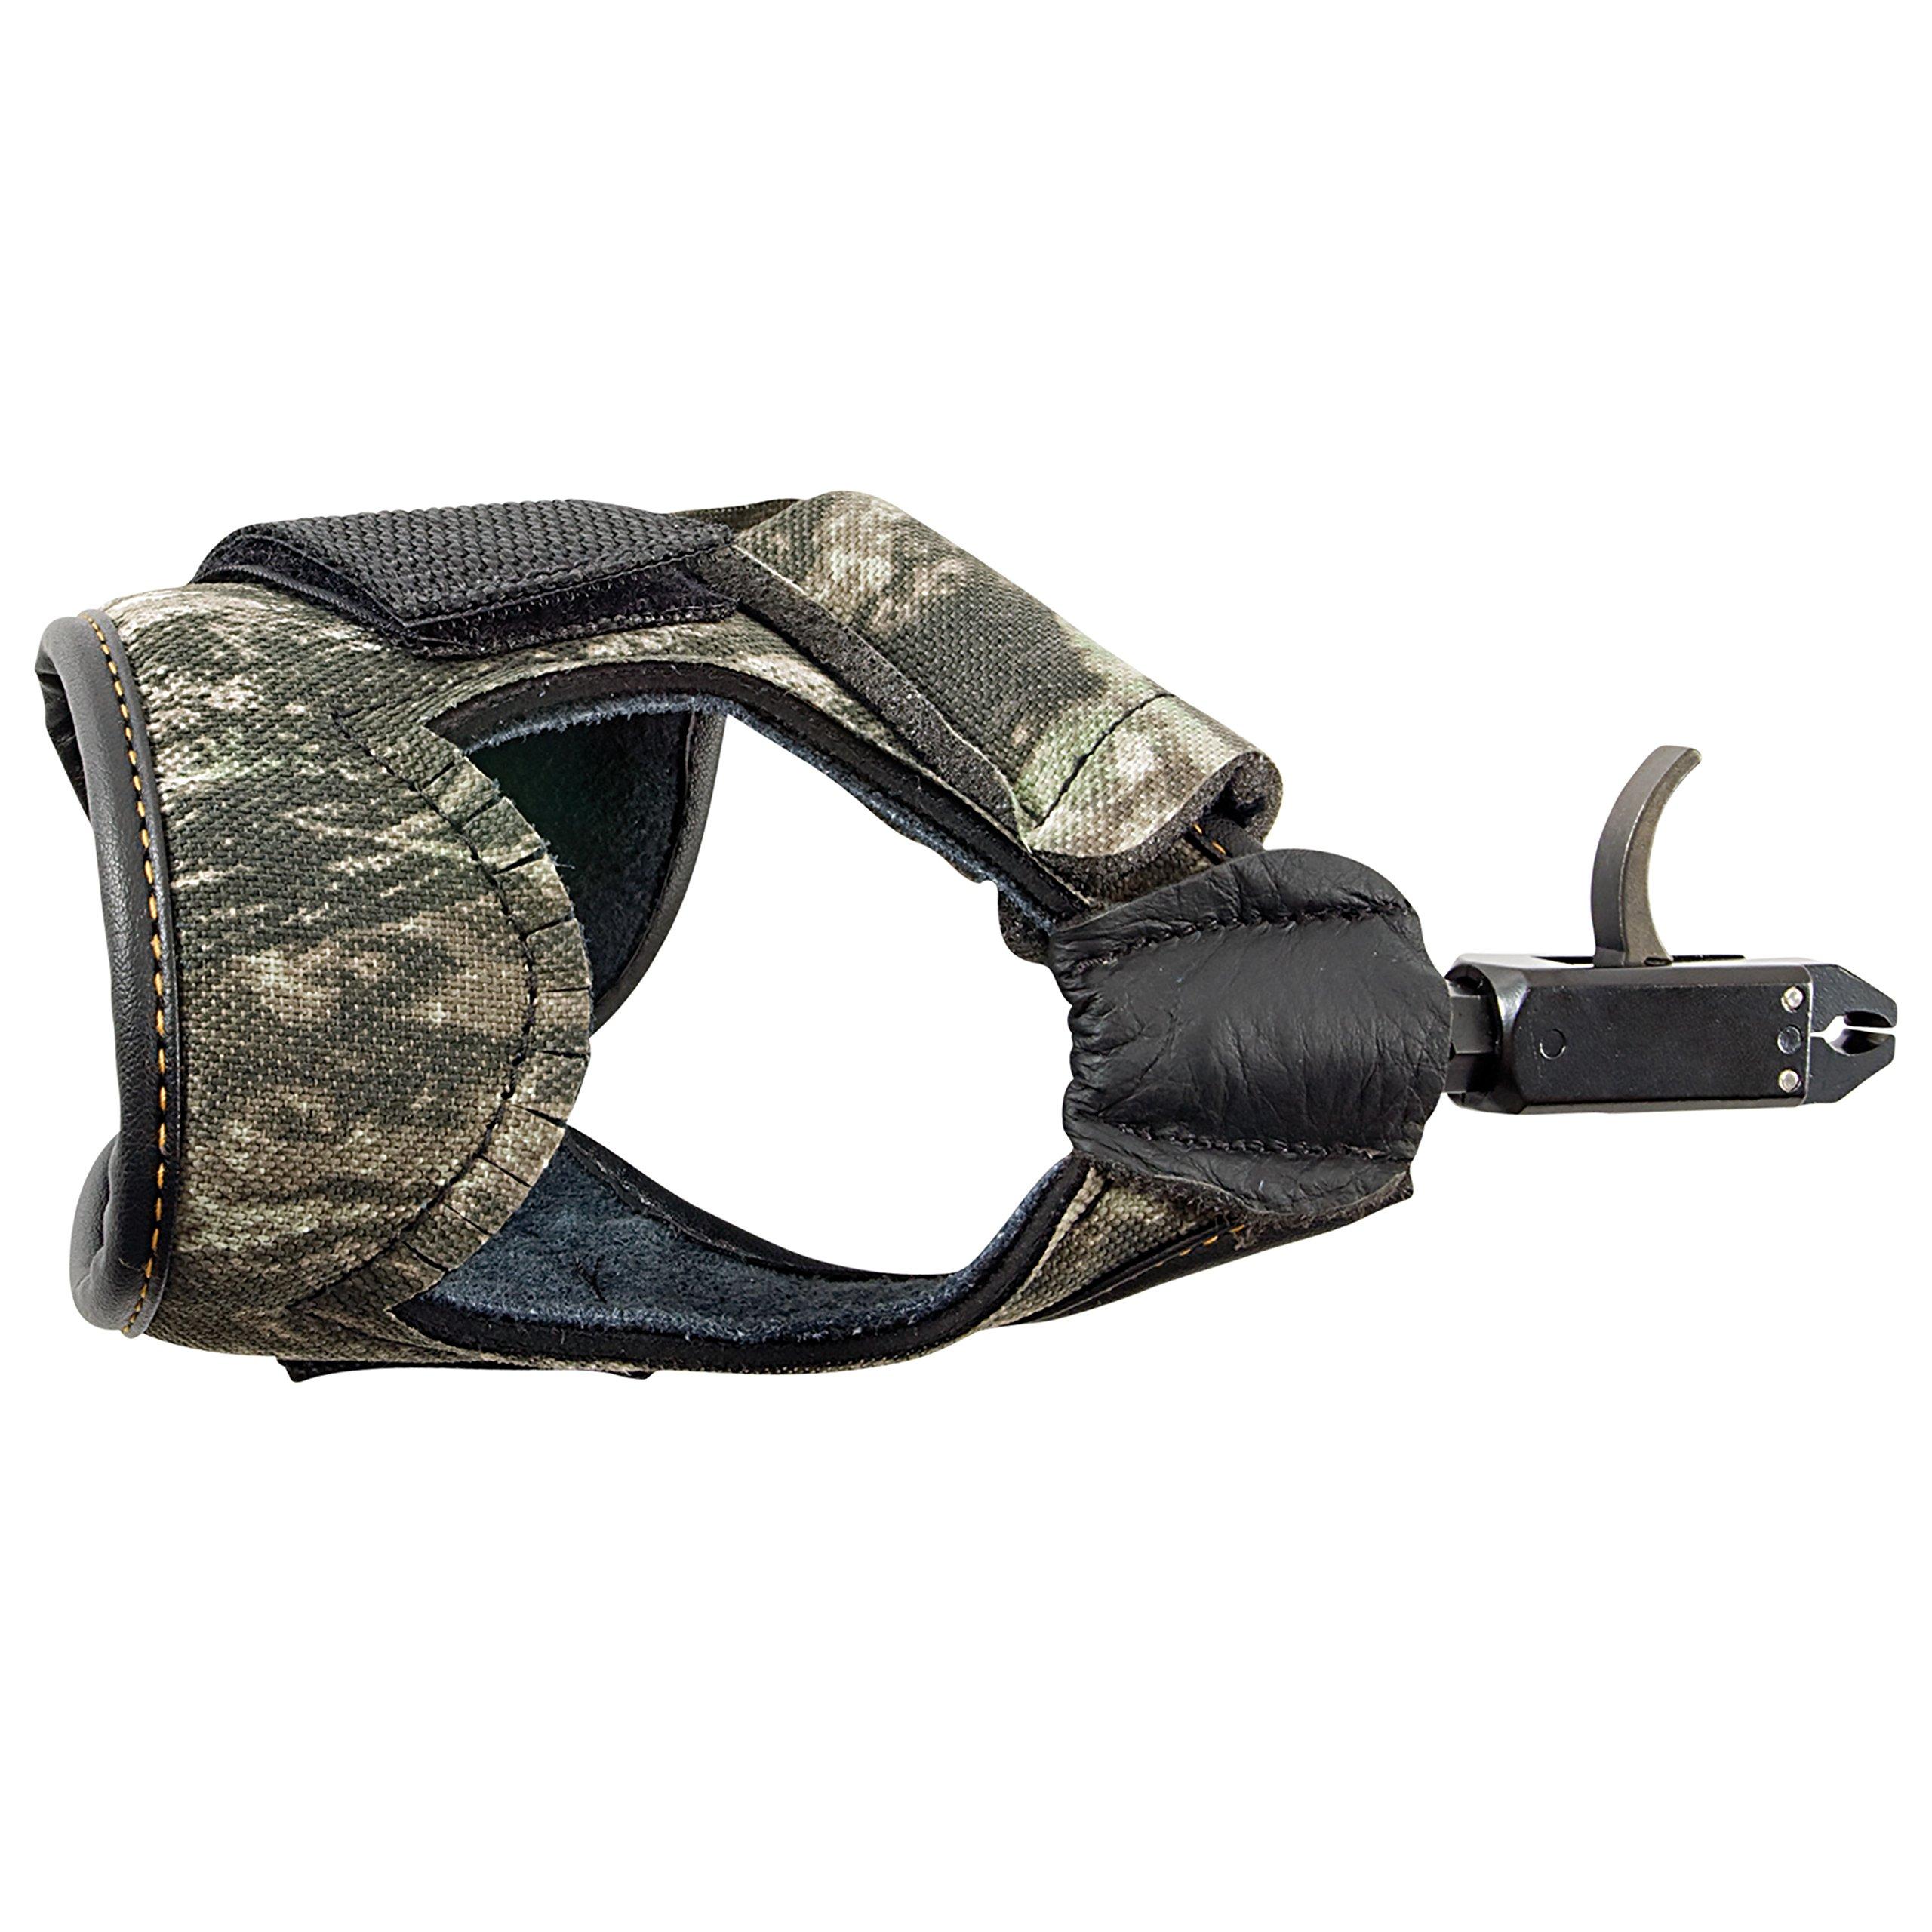 Allen Company Nu Caliper Archery Release, Mossy Oak Break-Up Camo